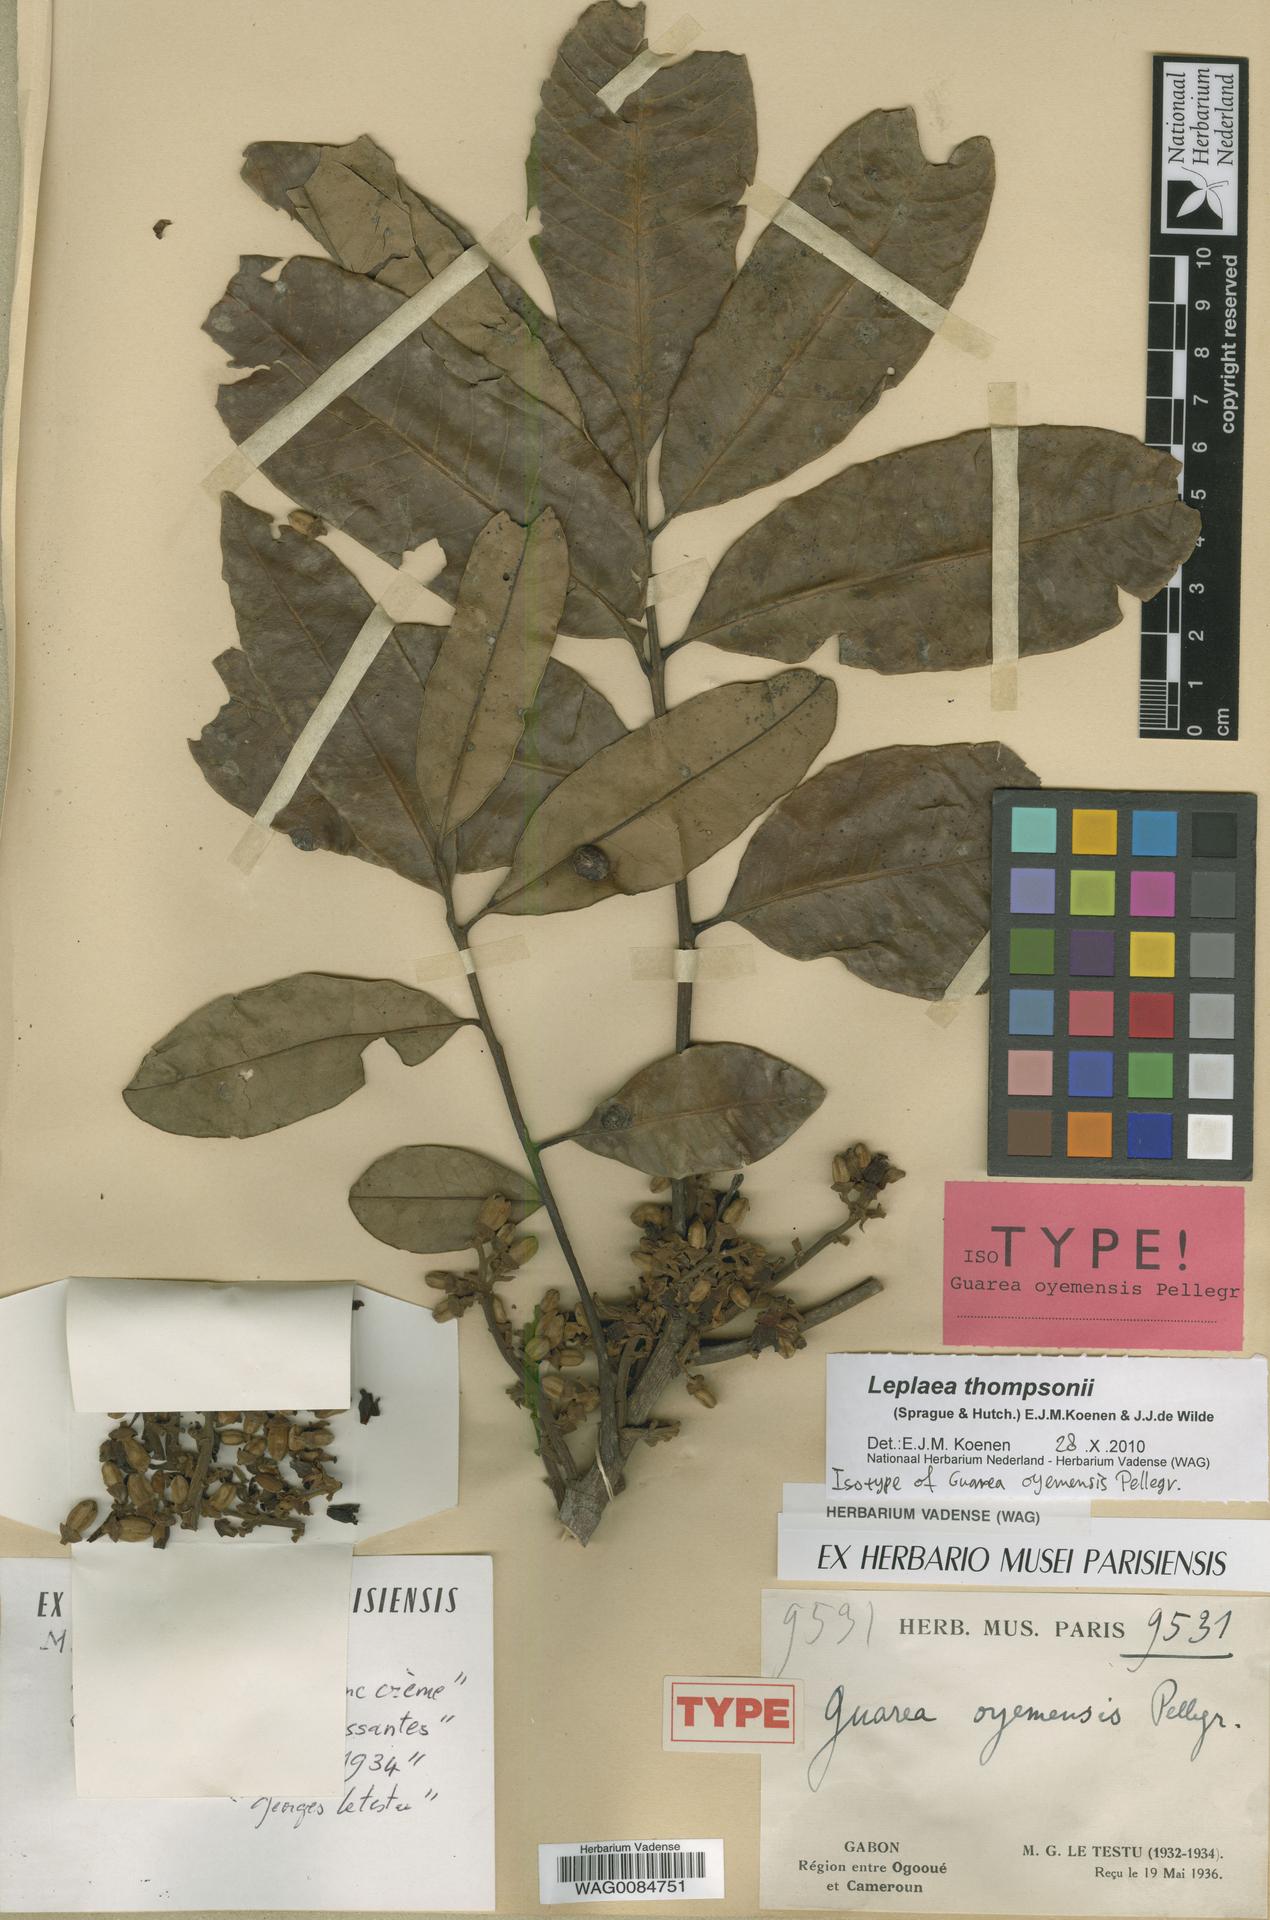 WAG0084751 | Leplaea thompsonii (Sprague & Hutch.) E.J.M.Koenen & J.J.de Wilde